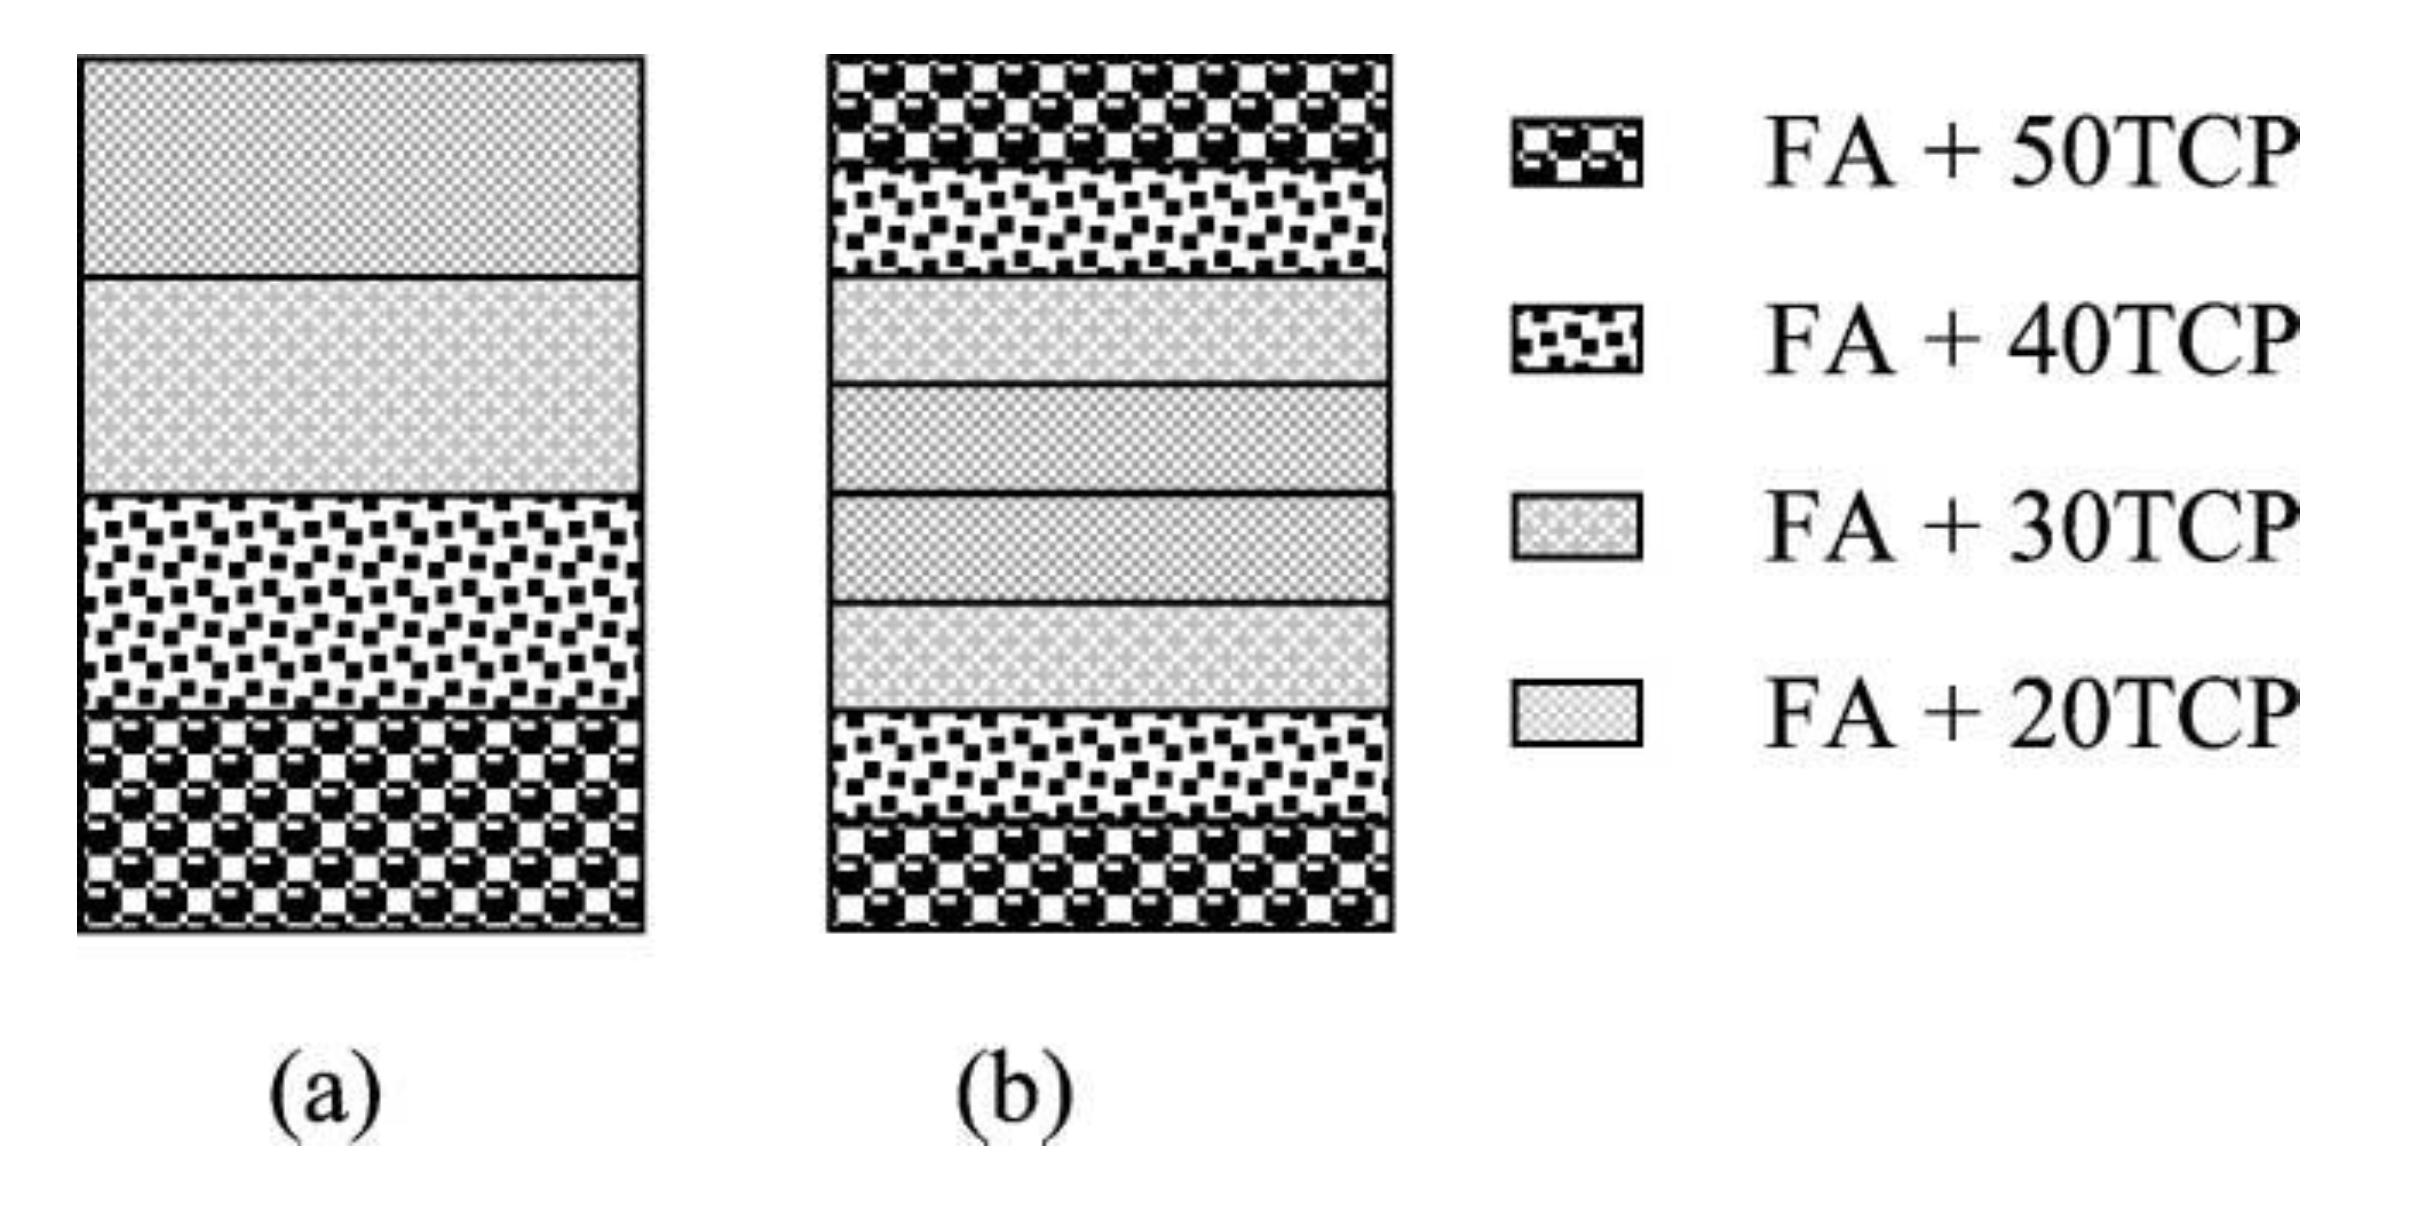 Jfb Free Full Text Calcium Orthophosphates As Bioceramics State Mueller Furnace Wiring Diagram Older 01 00022 G009 1024